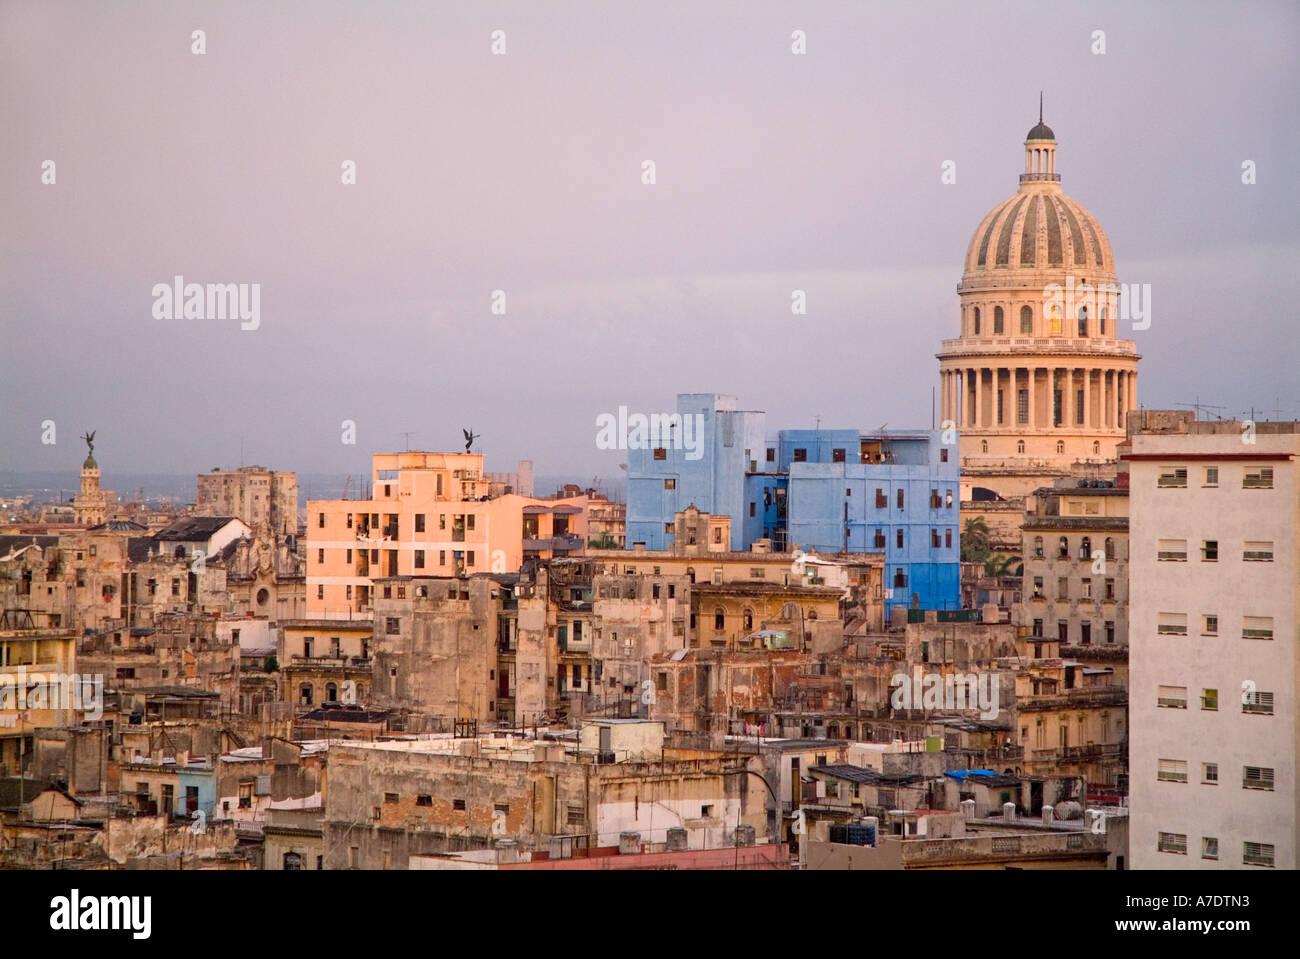 Havanna, Kuba - bei Sonnenuntergang / Dämmerung Stockbild